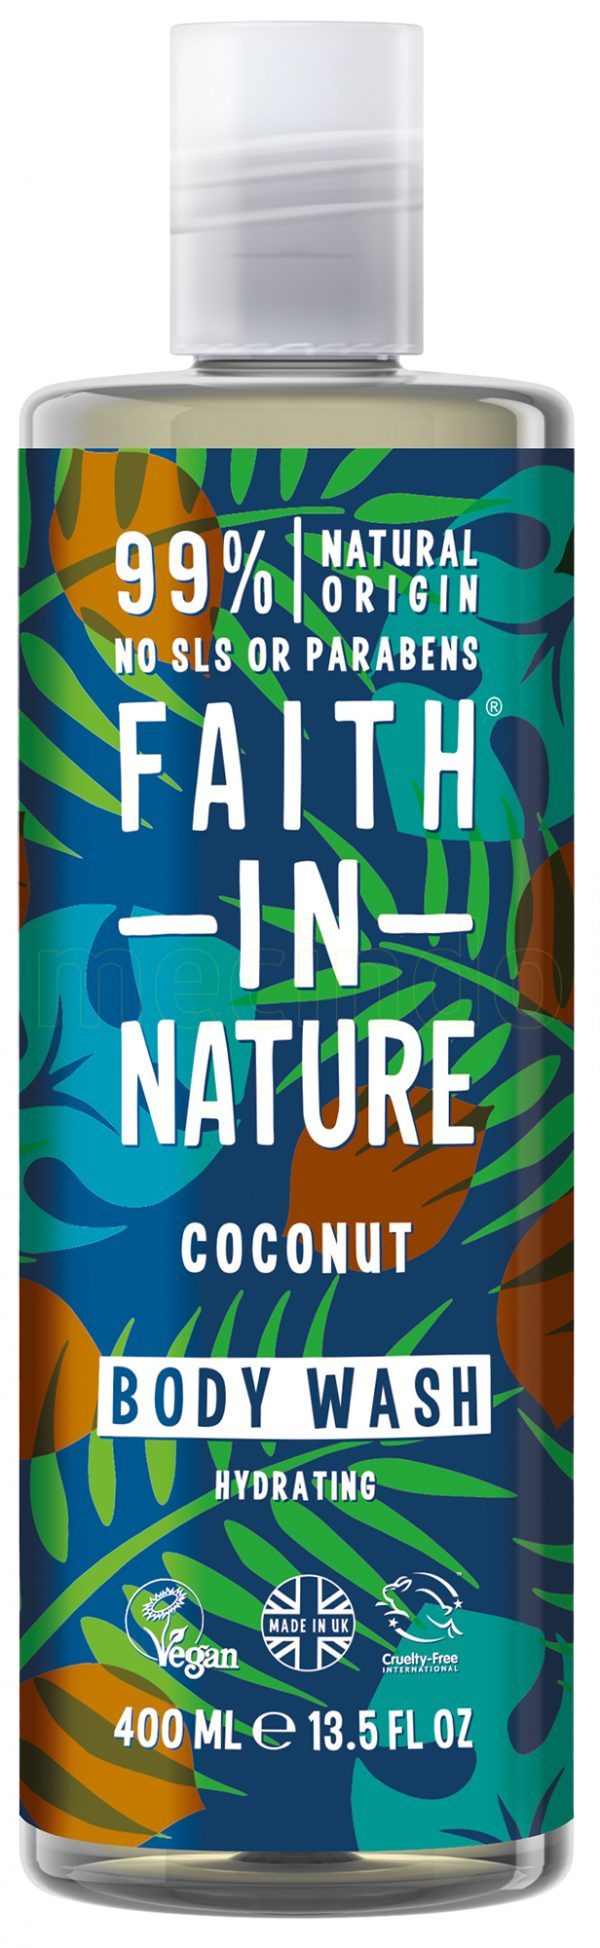 Faith in Nature Coconut Shower Gel & Foam Bath - 400 ml